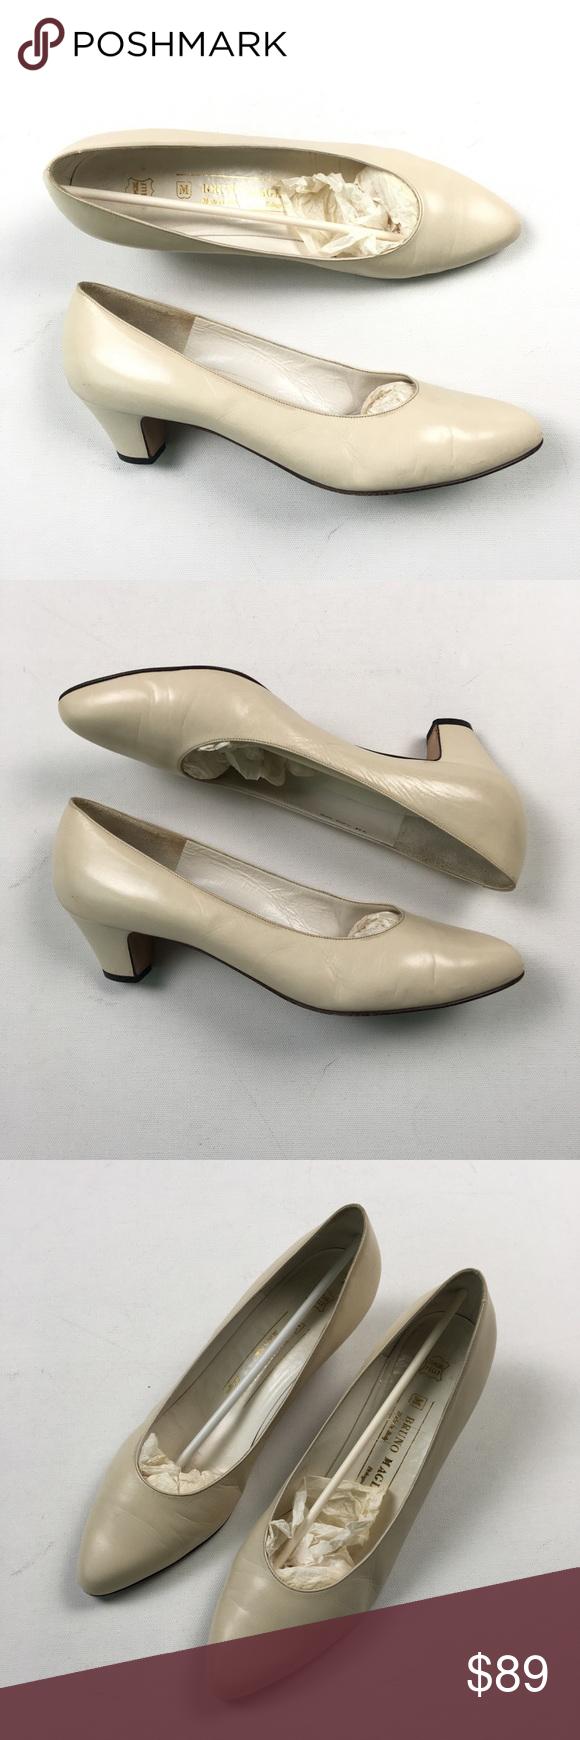 1c5f6748d Bruno Magli Womens Cream Heels 9 A26 Pre owned Bruno Magli Shoes Heels